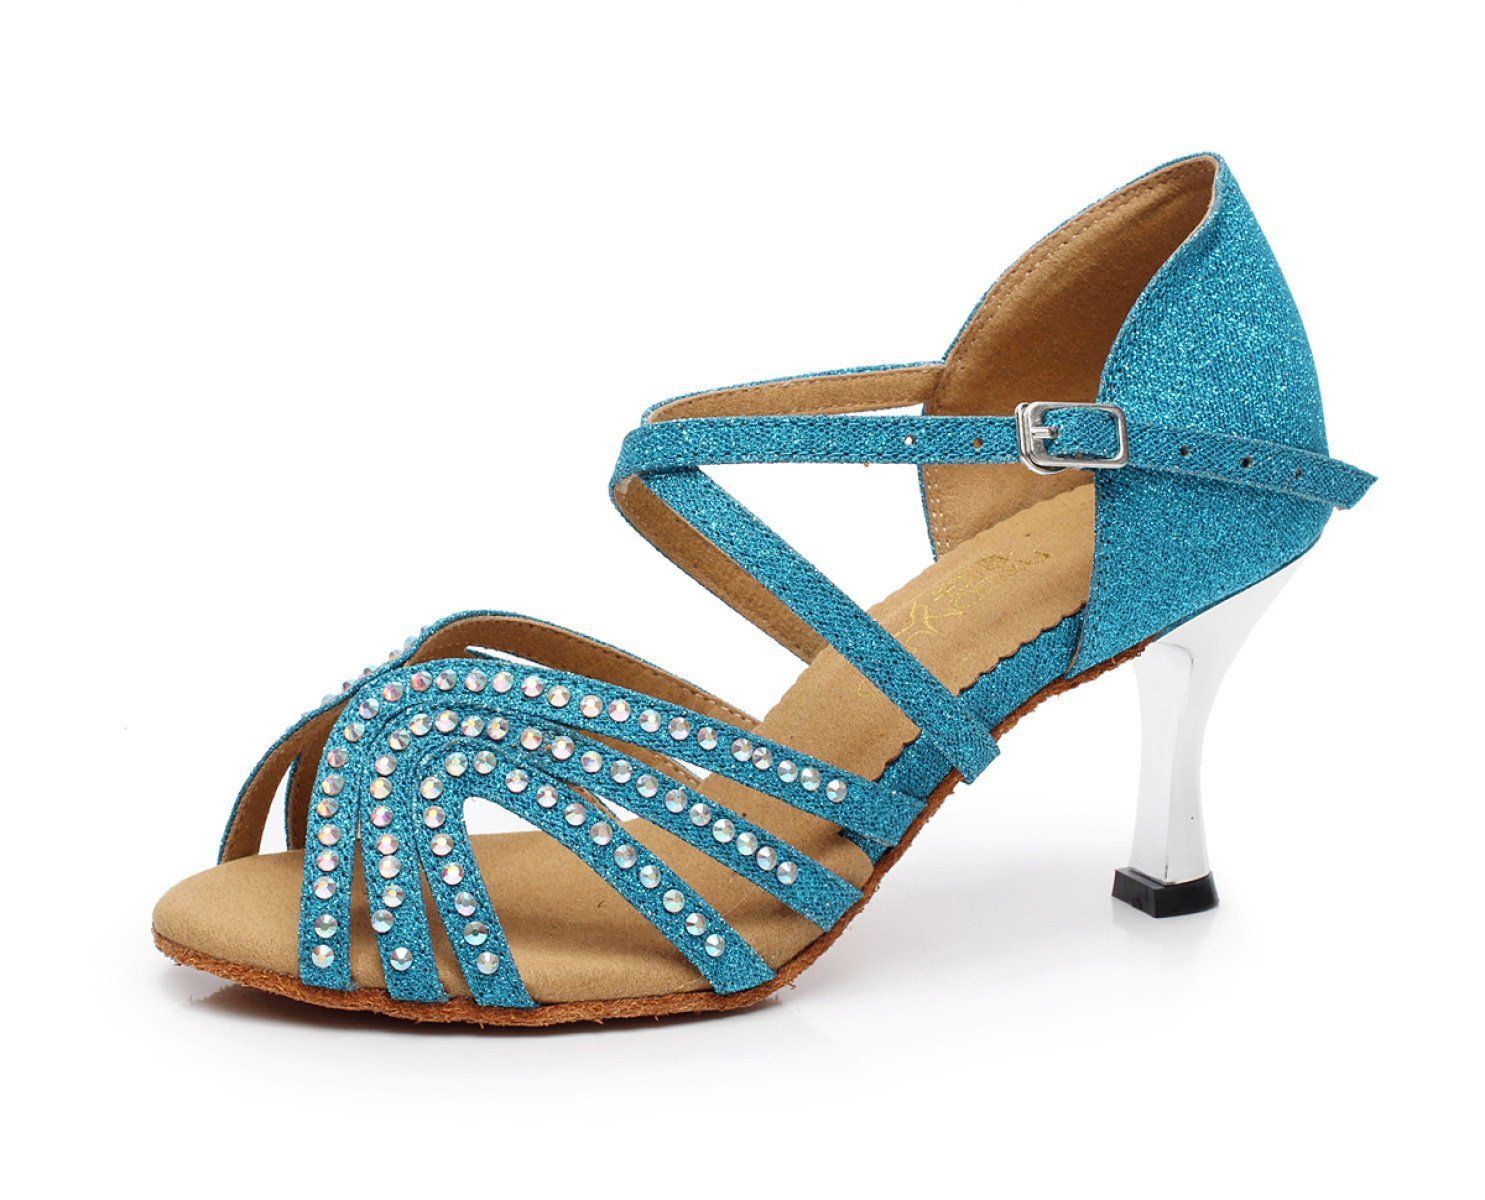 JSHOE Latin Frauen Kristalle Sparking Satin Latin JSHOE Salsa Tanzschuh / Tango / Chacha / Samba / Modern / Jazz Schuhe Sandalen High Heels,Blau-heeled7.5cm-UK7/EU41/Our42 - b6ee2e